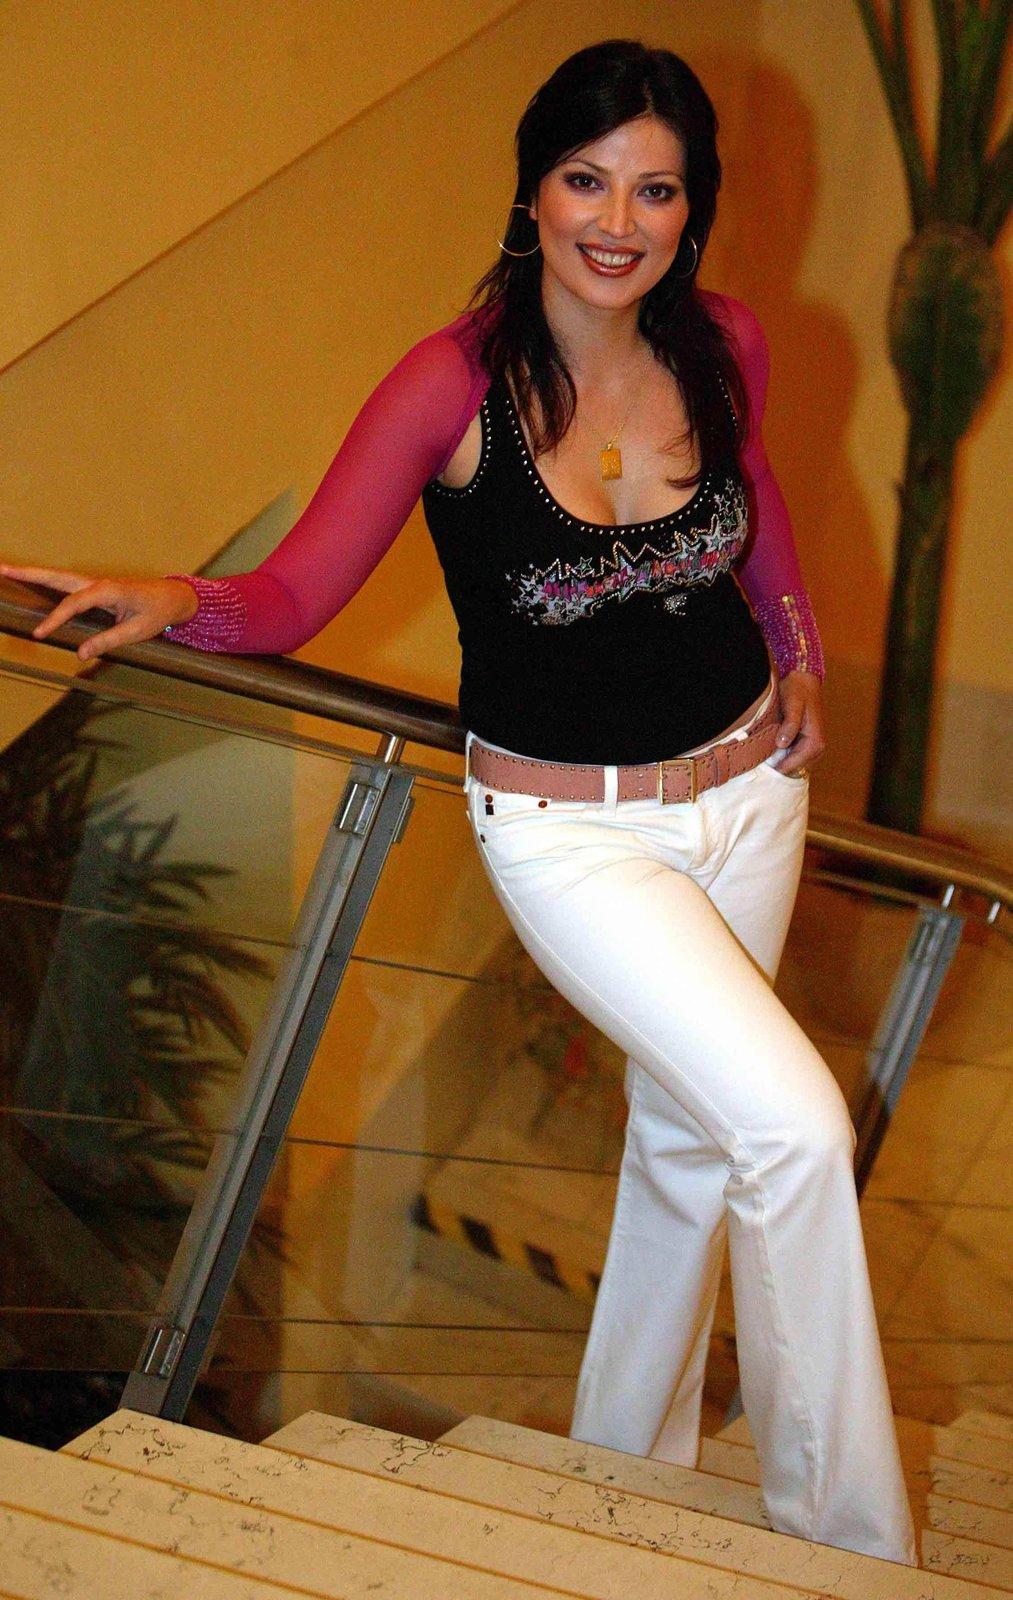 V roce 2005 si Ivana stále držela kila na uzdě